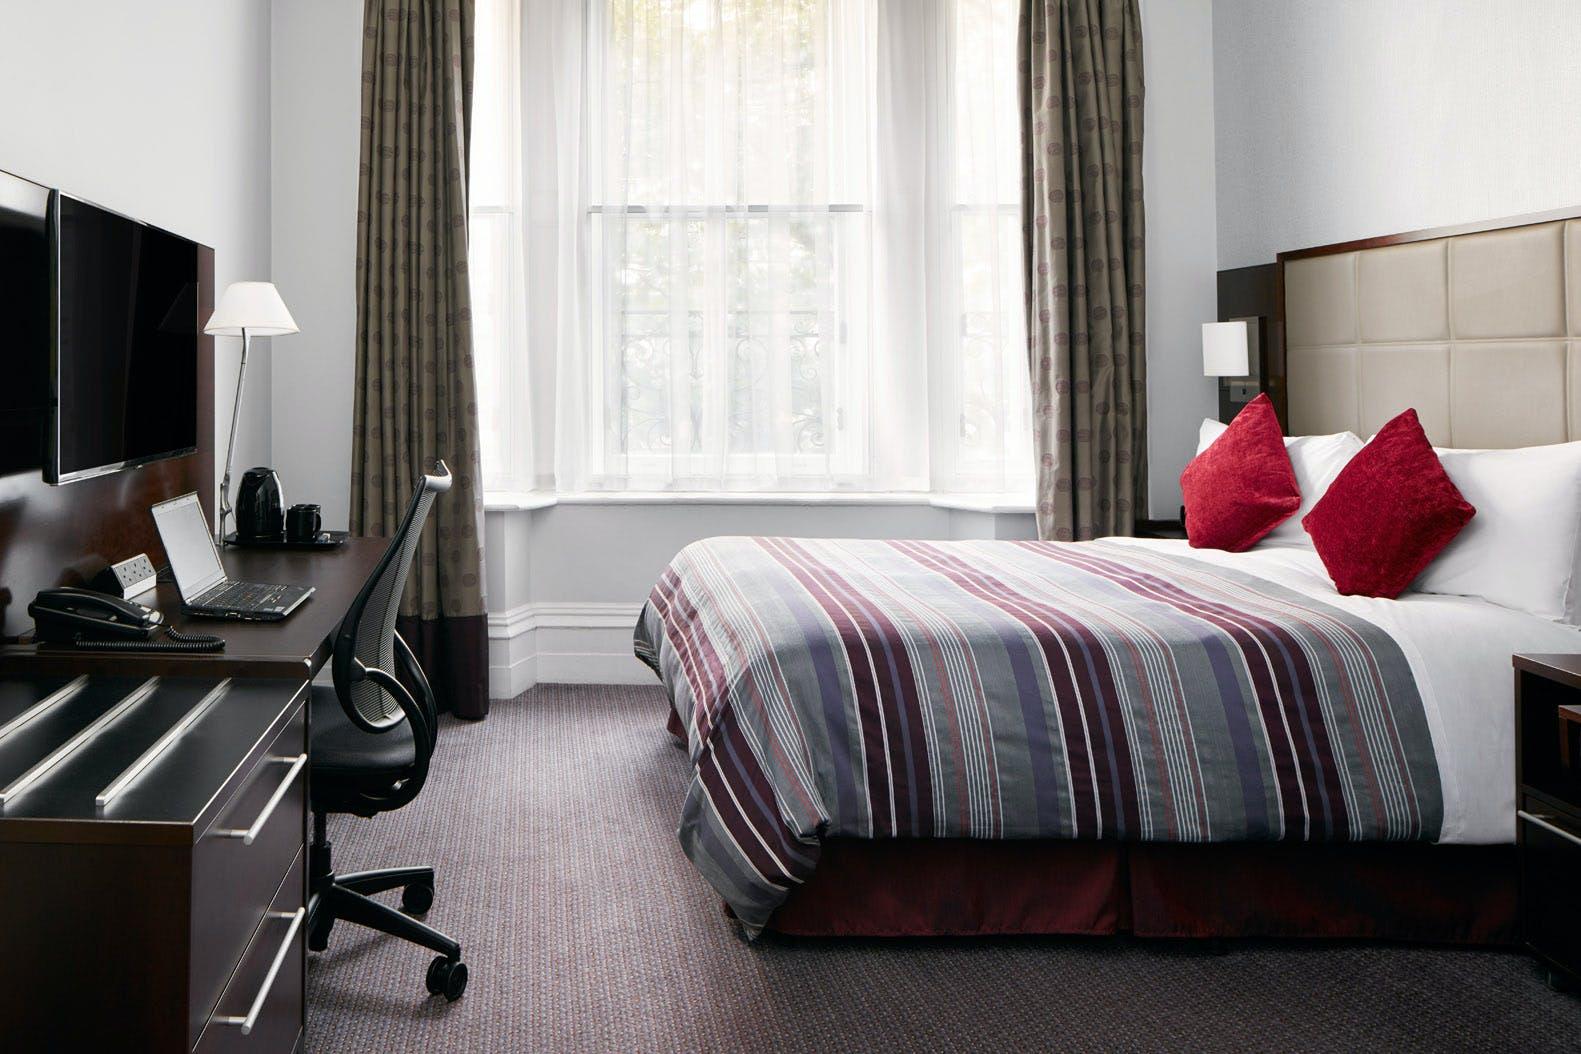 Deluxe Hotel Room Trafalgar Square London